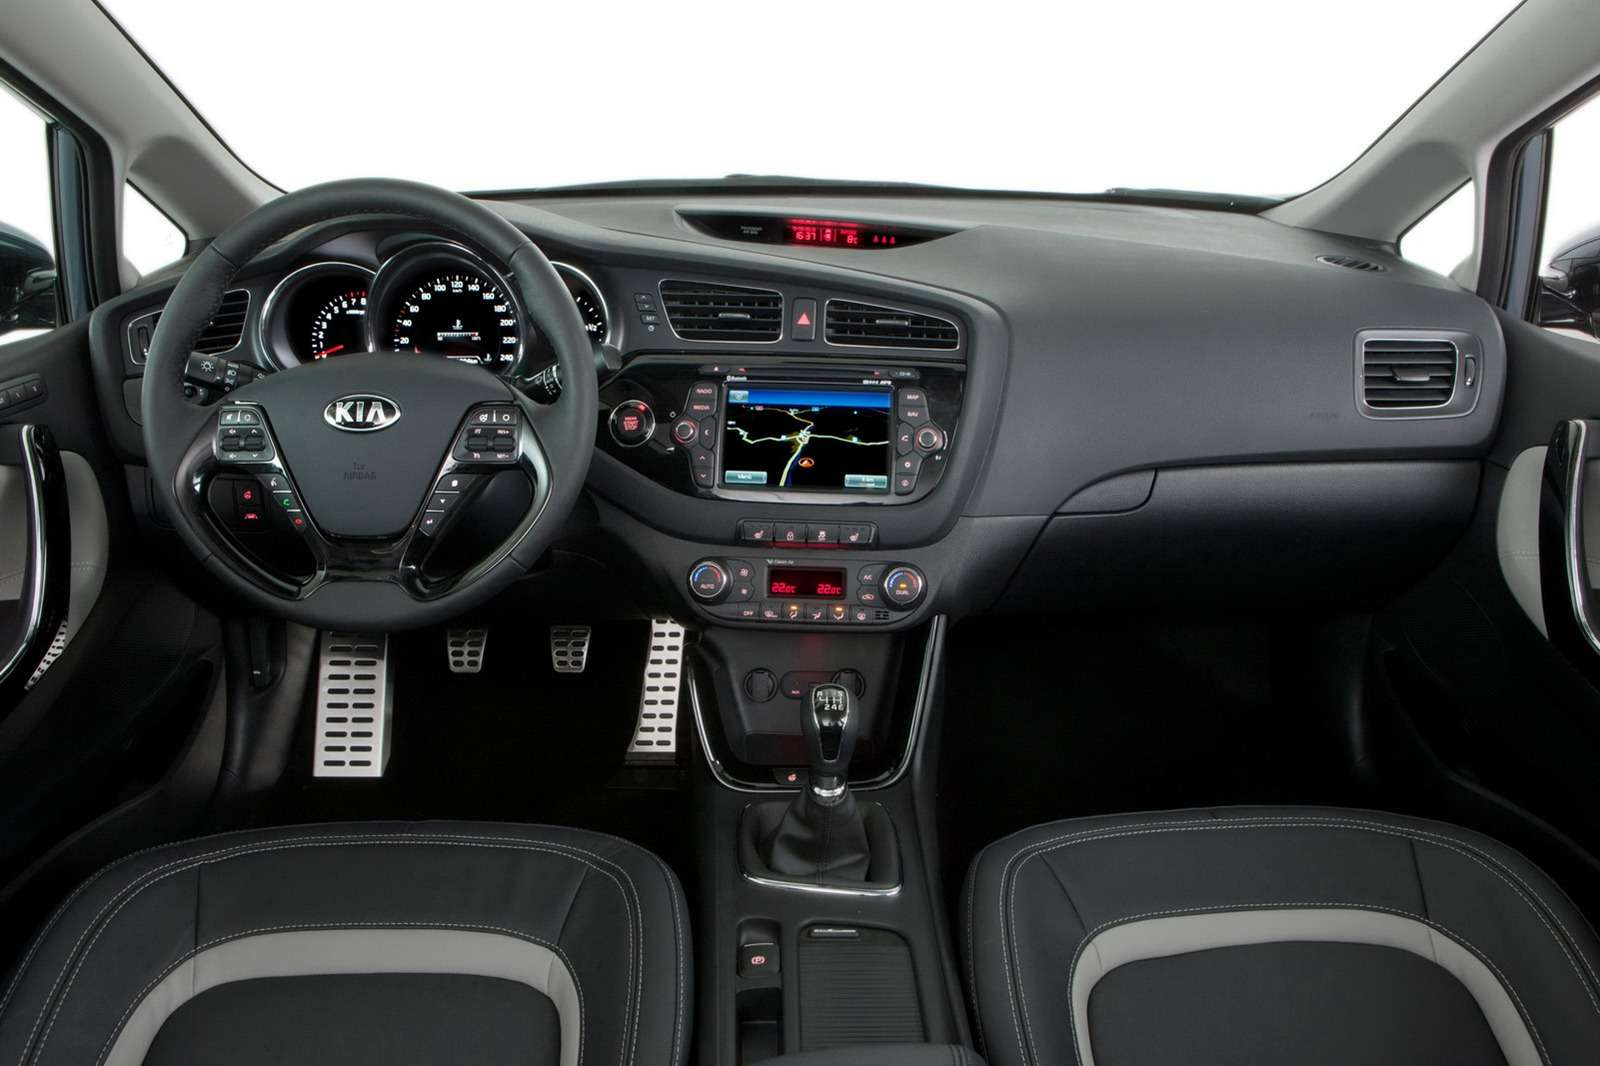 Kia Ceed 2012